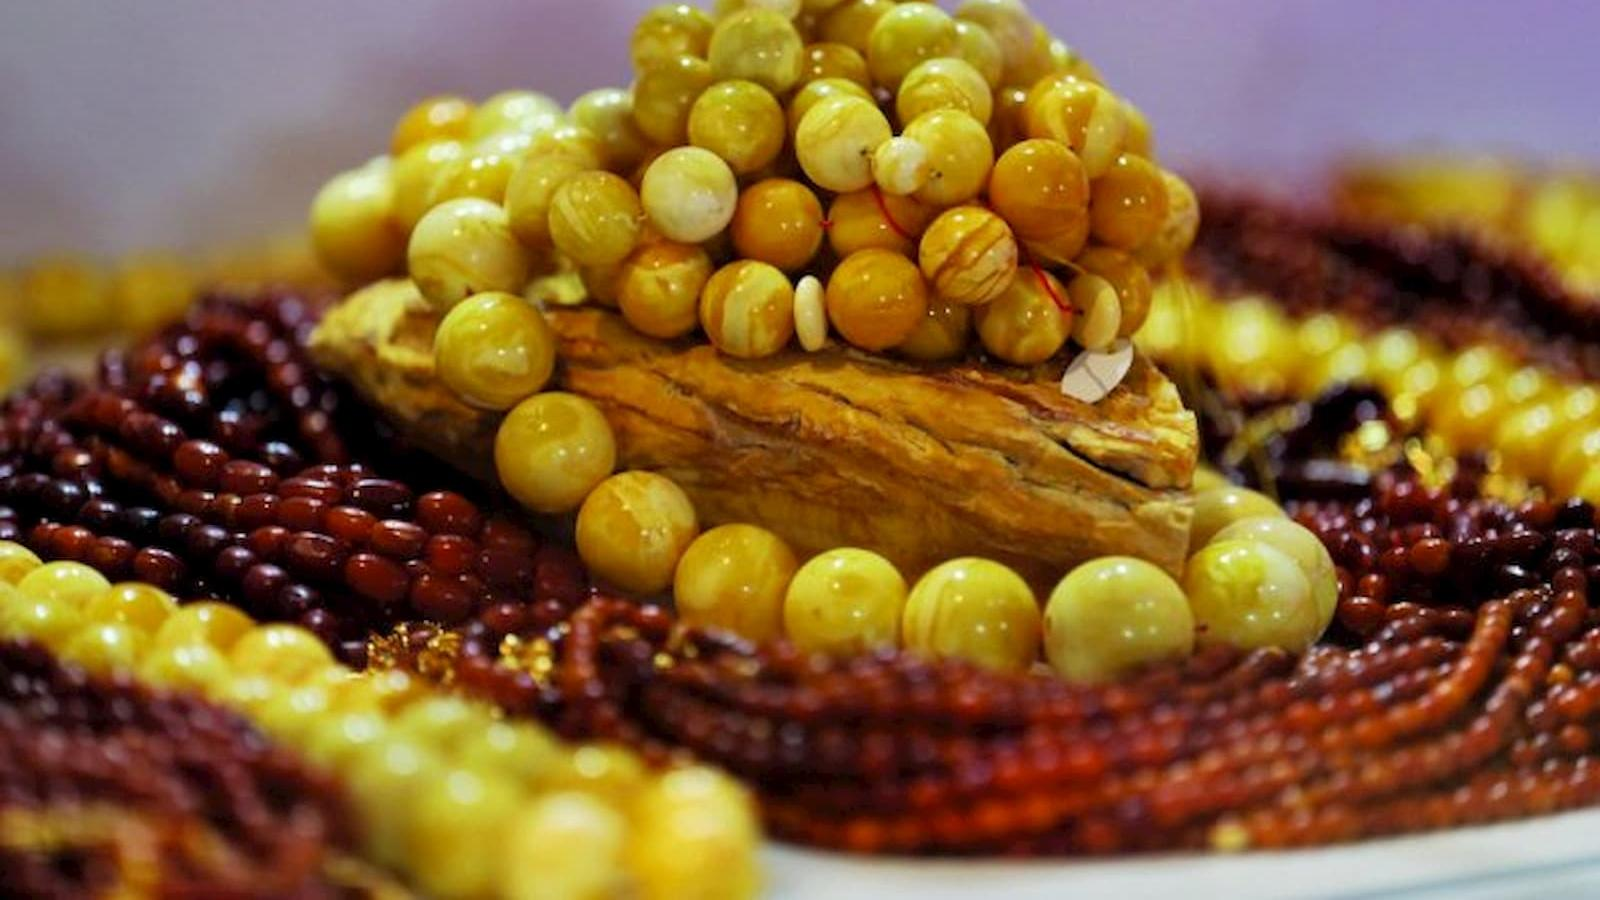 International Amber Exhibition to open tomorrow at Katara